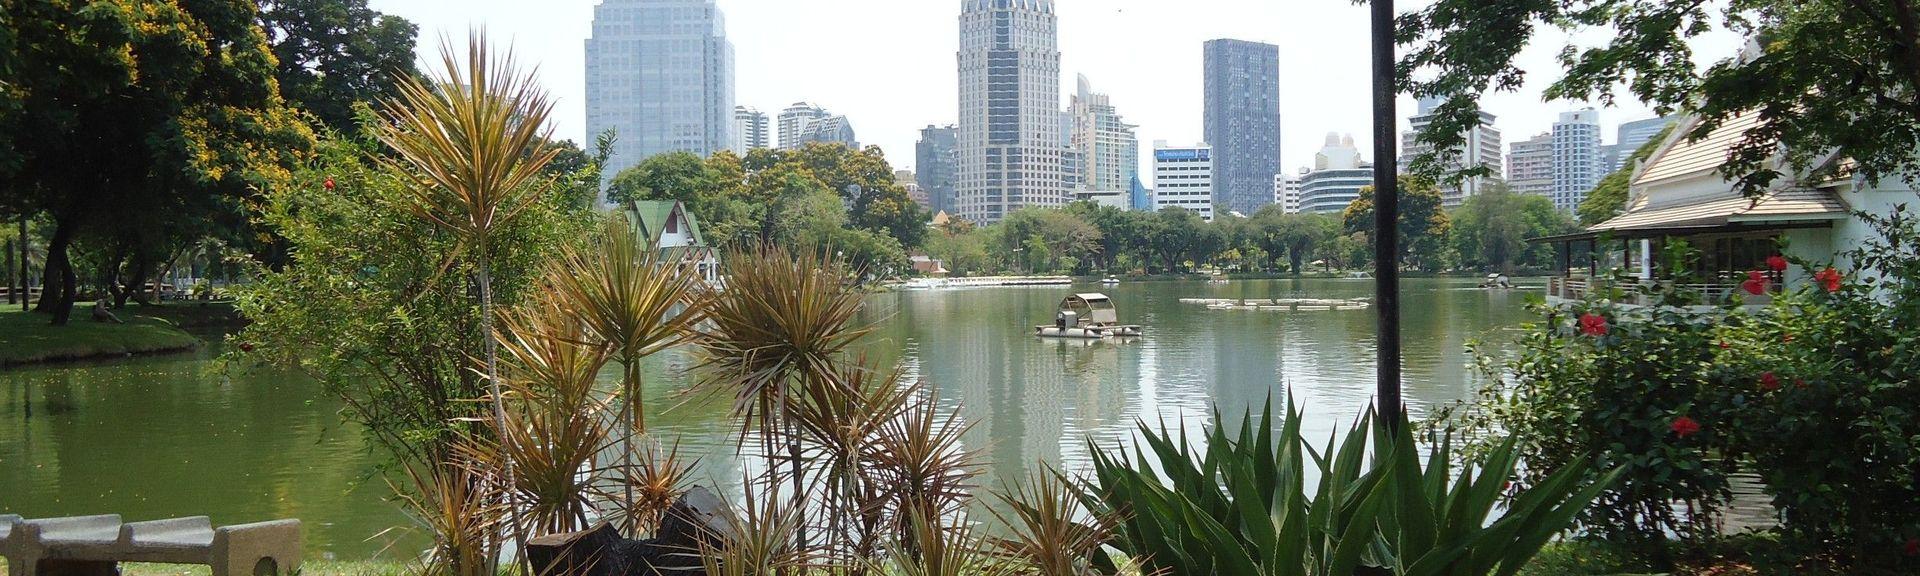 Lumphini Park, Bangkok, Bangkok (province), Thailand